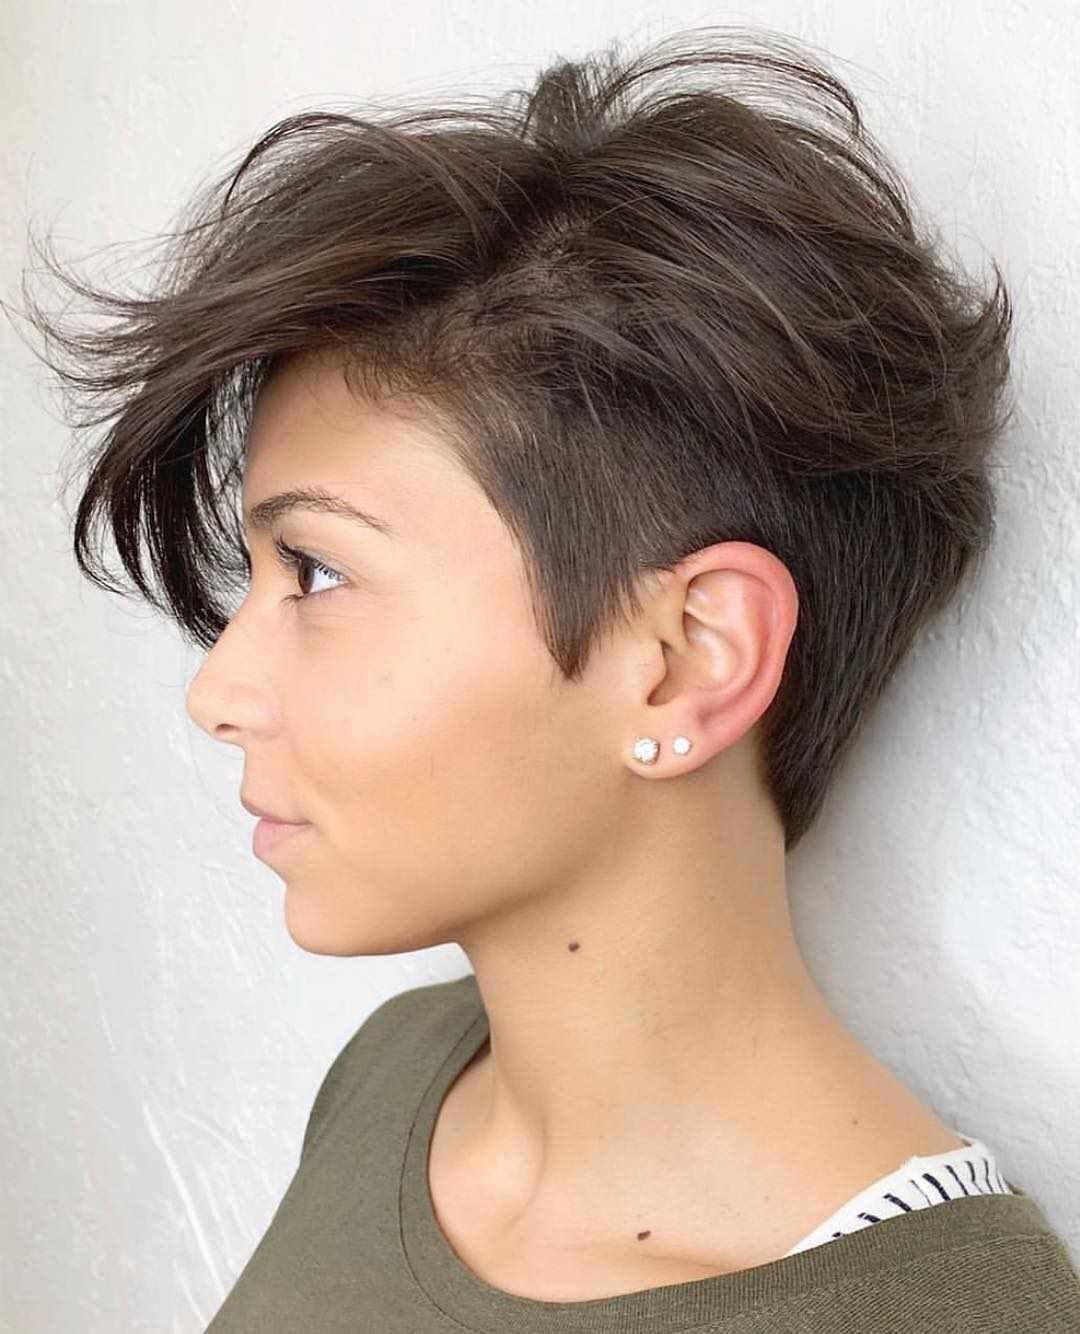 Be Inspired By This 40 Short Hairstyles For Your Next Hairdresser Visit Short Hairstyles Look Great With Almost Any S Frisuren Kurz Haarschnitt Kurz Frisuren